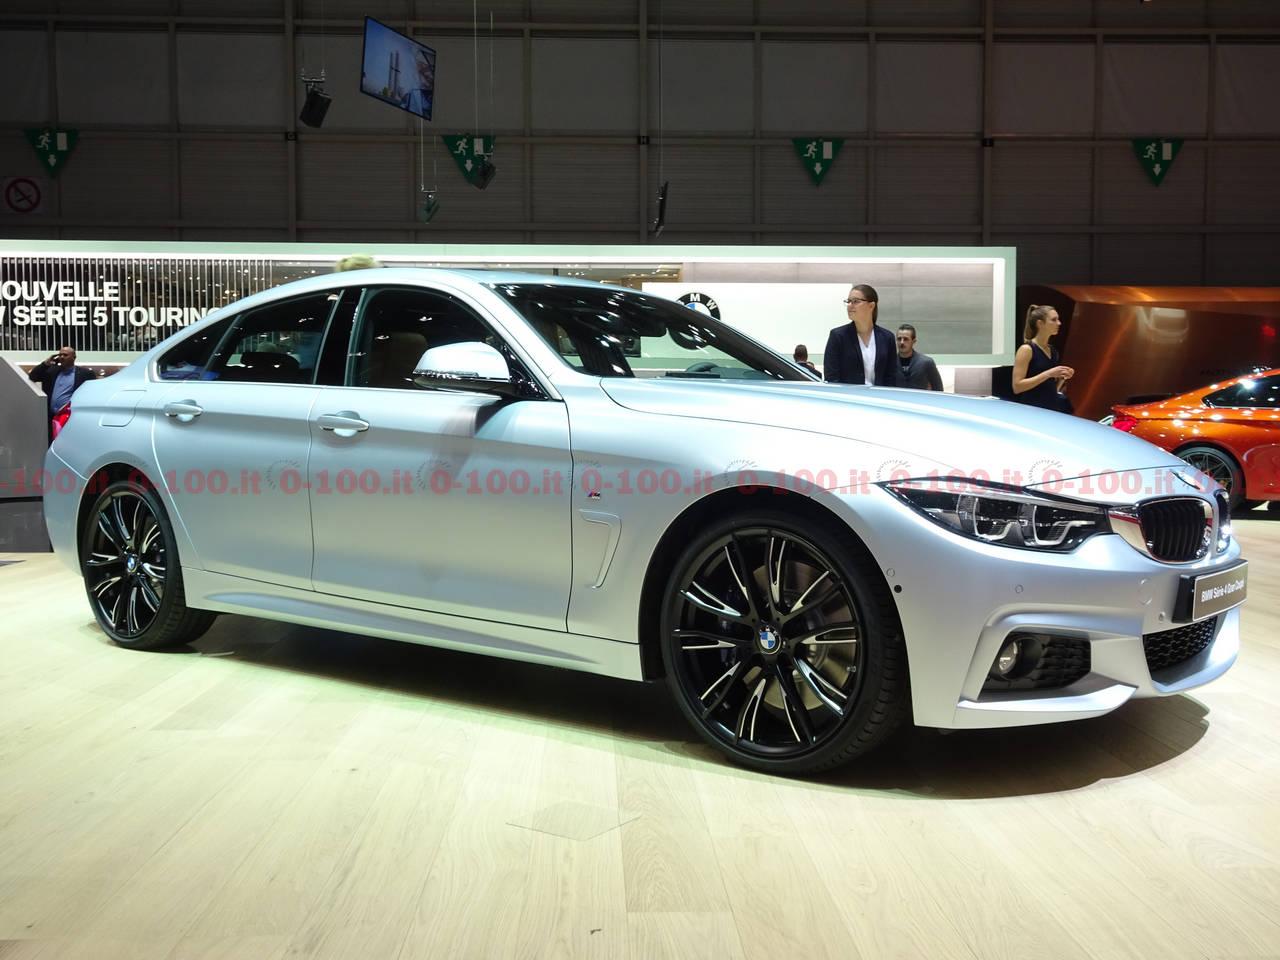 Ginevra-geneva-geneve-2017-BMW_Serie-4-gran-coupe_0-100_4